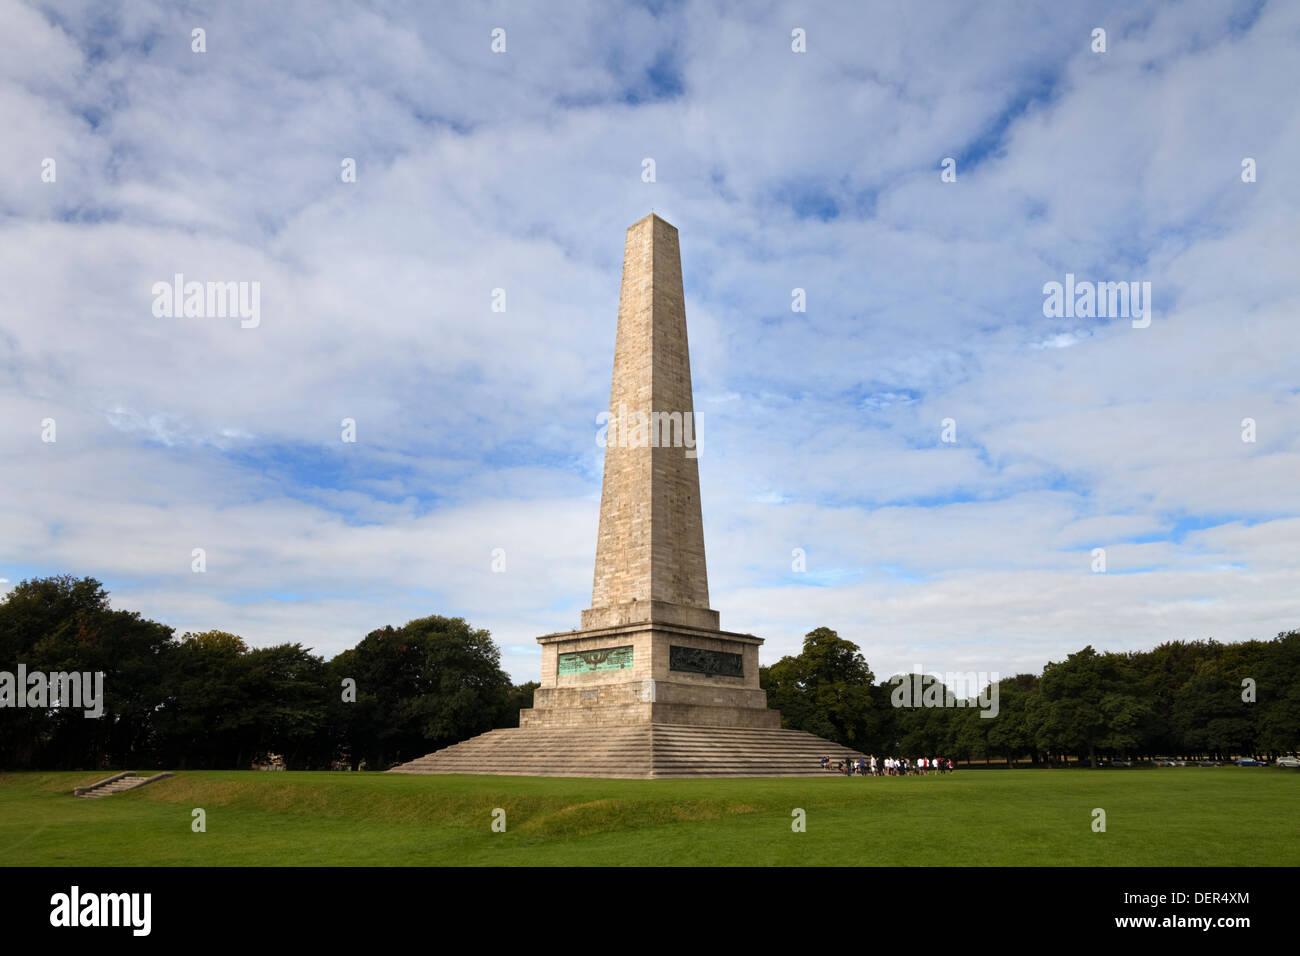 The Wellington Monument obelisk, The Phoenix Park, Dublin, Ireland. - Stock Image